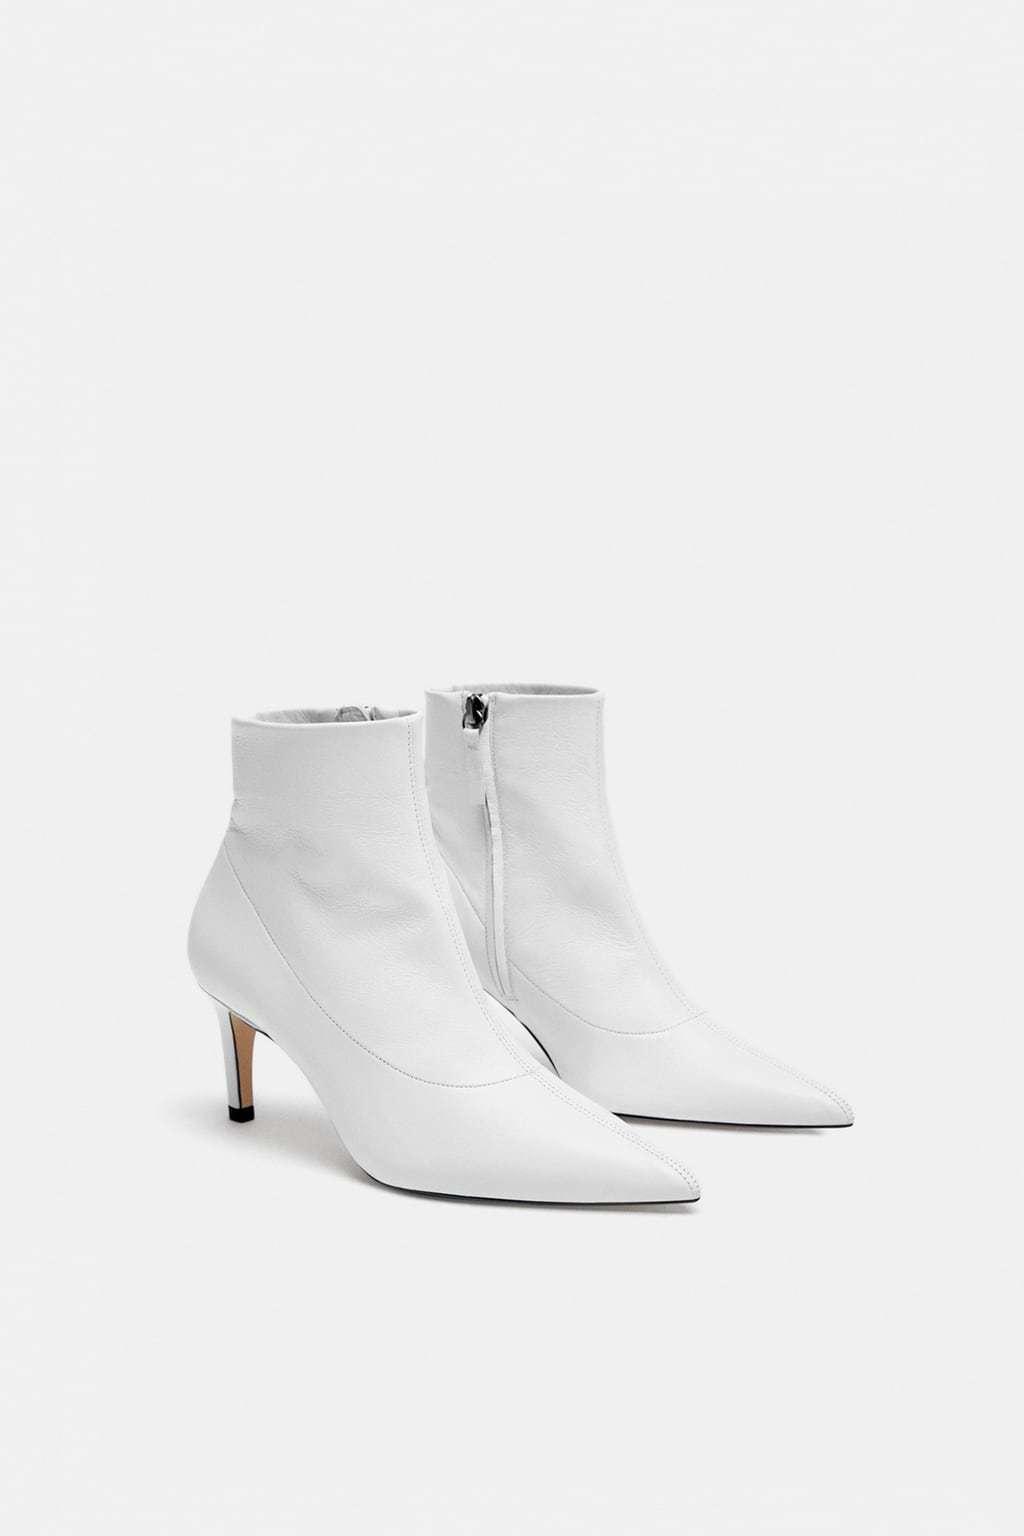 Botín de piel blanco, de Zara (69,95 euros).